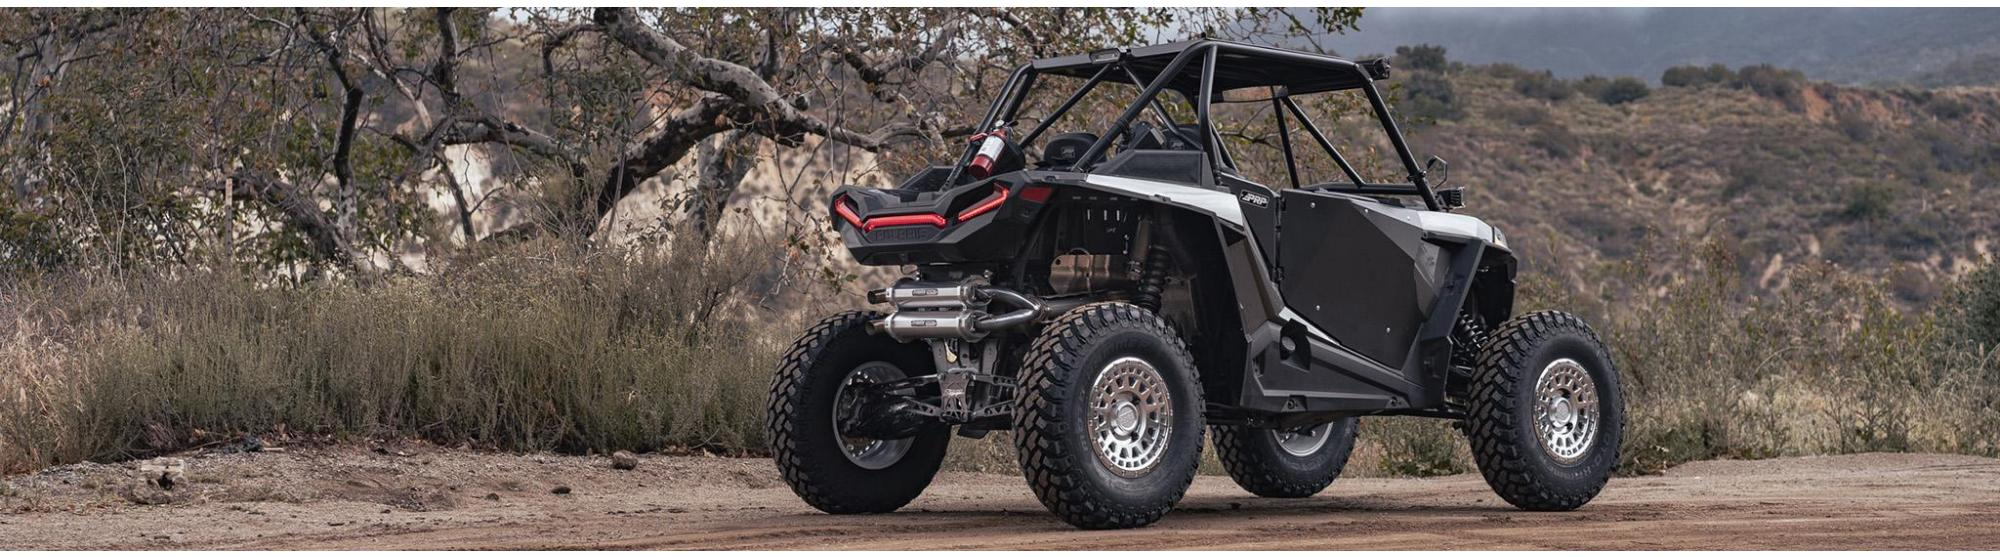 The All New Parker UTV From Black Rhino Wheels